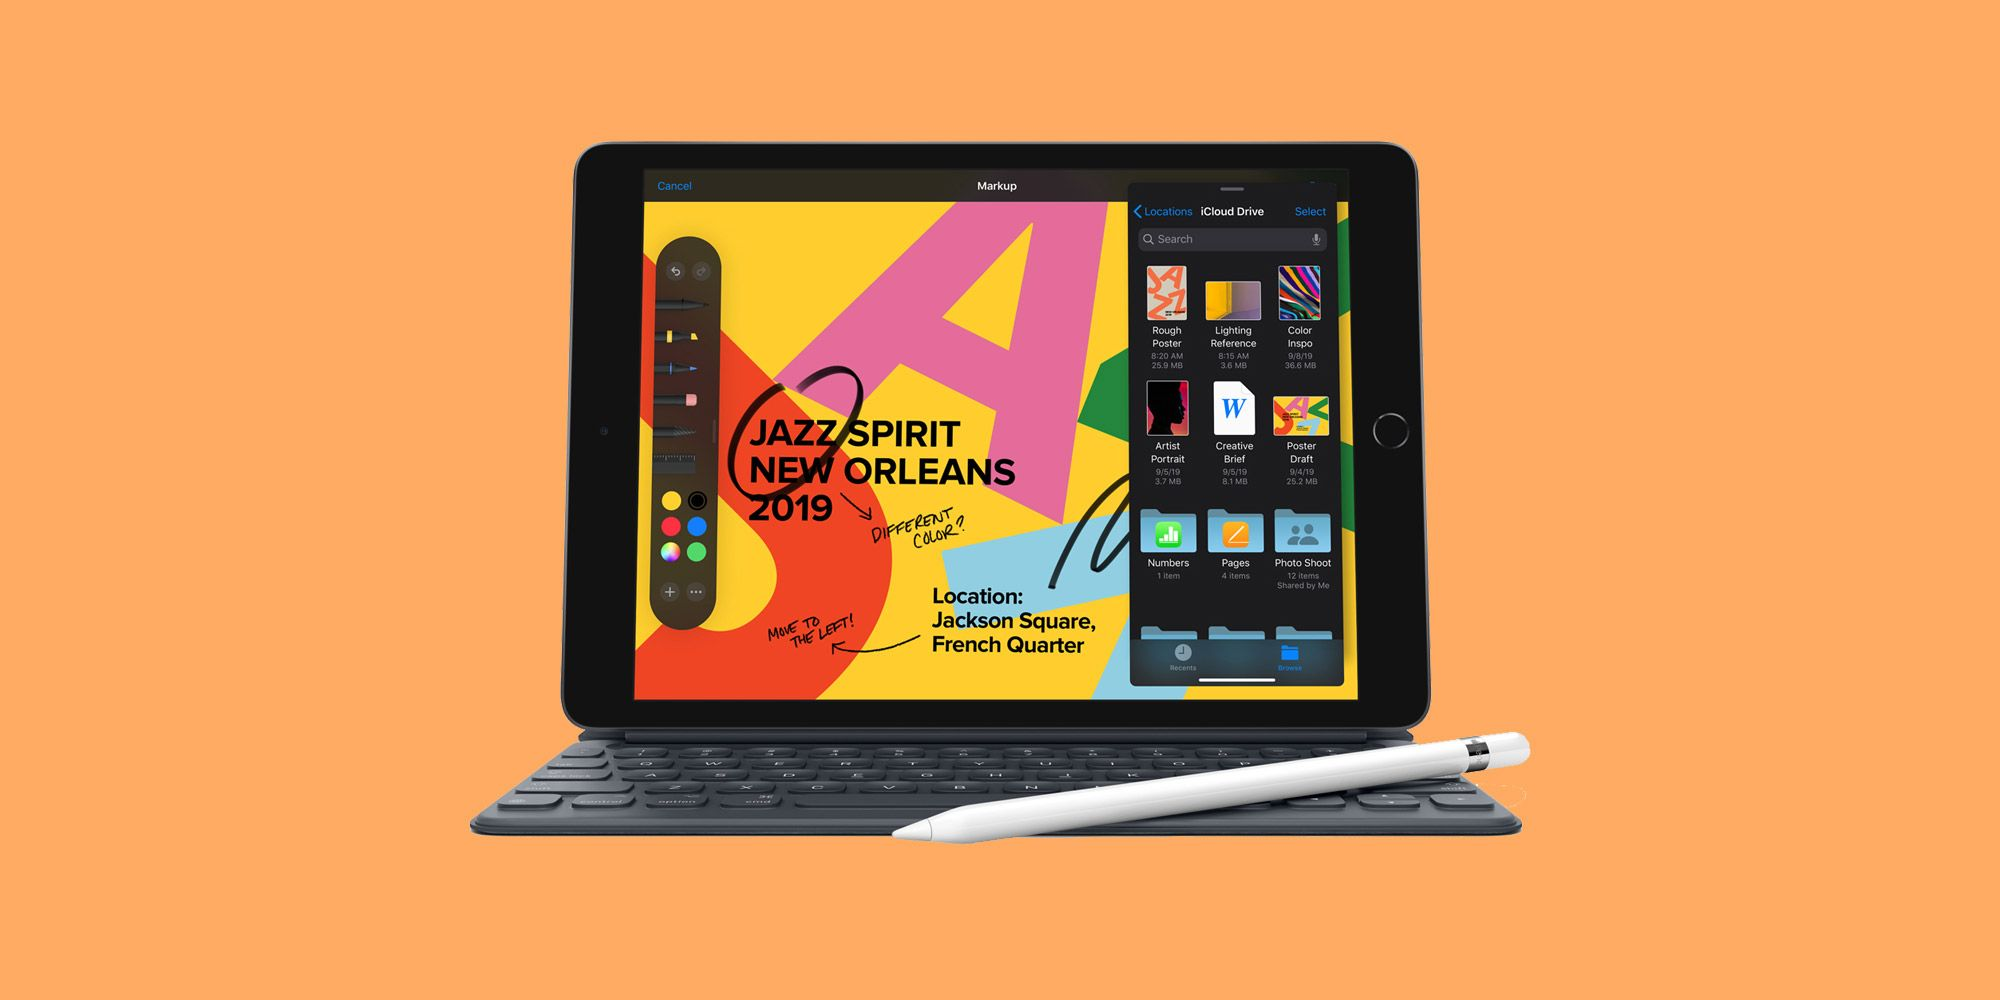 Apple iPad 10.2in 2019: Is it worth spending your money on?